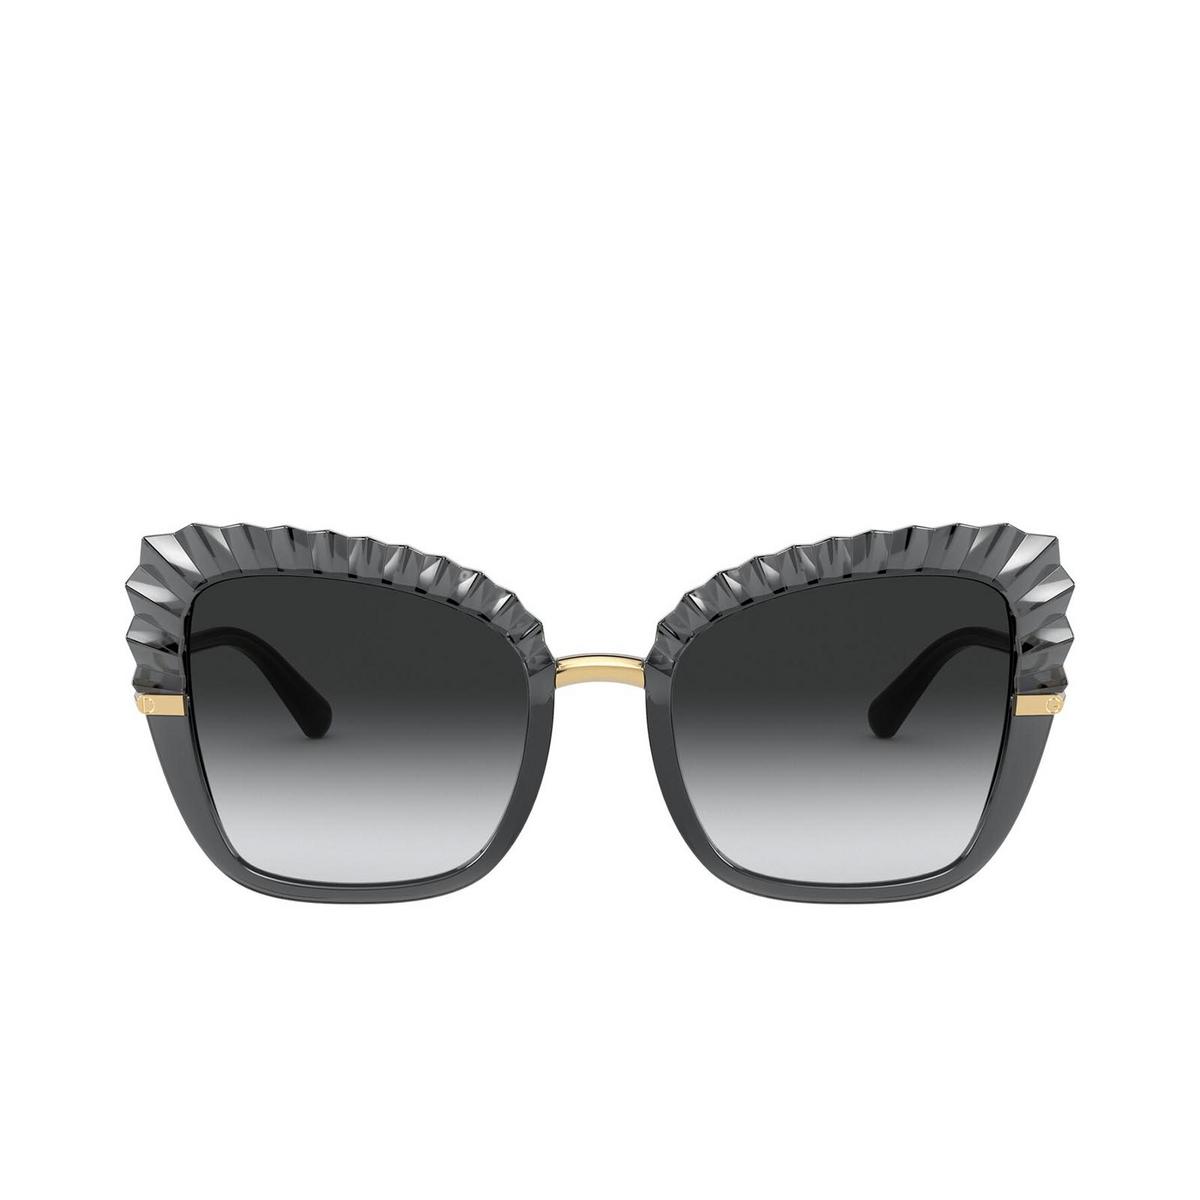 Dolce & Gabbana® Butterfly Sunglasses: DG6131 color Transparent Grey 31608G - front view.